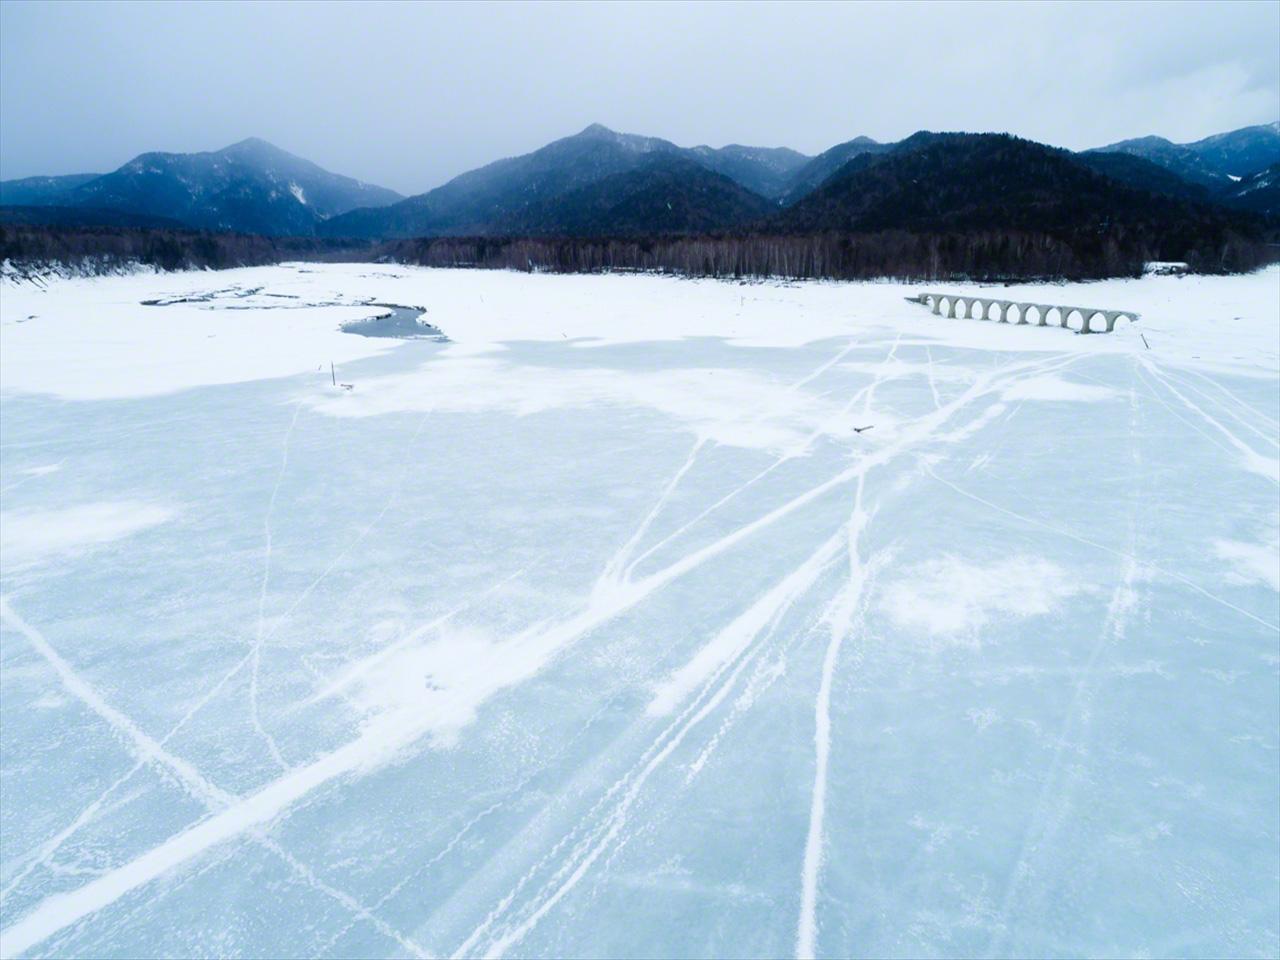 Es di danau menjadi rapuh di bulan Maret, sehingga berbahaya untuk menjelajah ke permukaan.